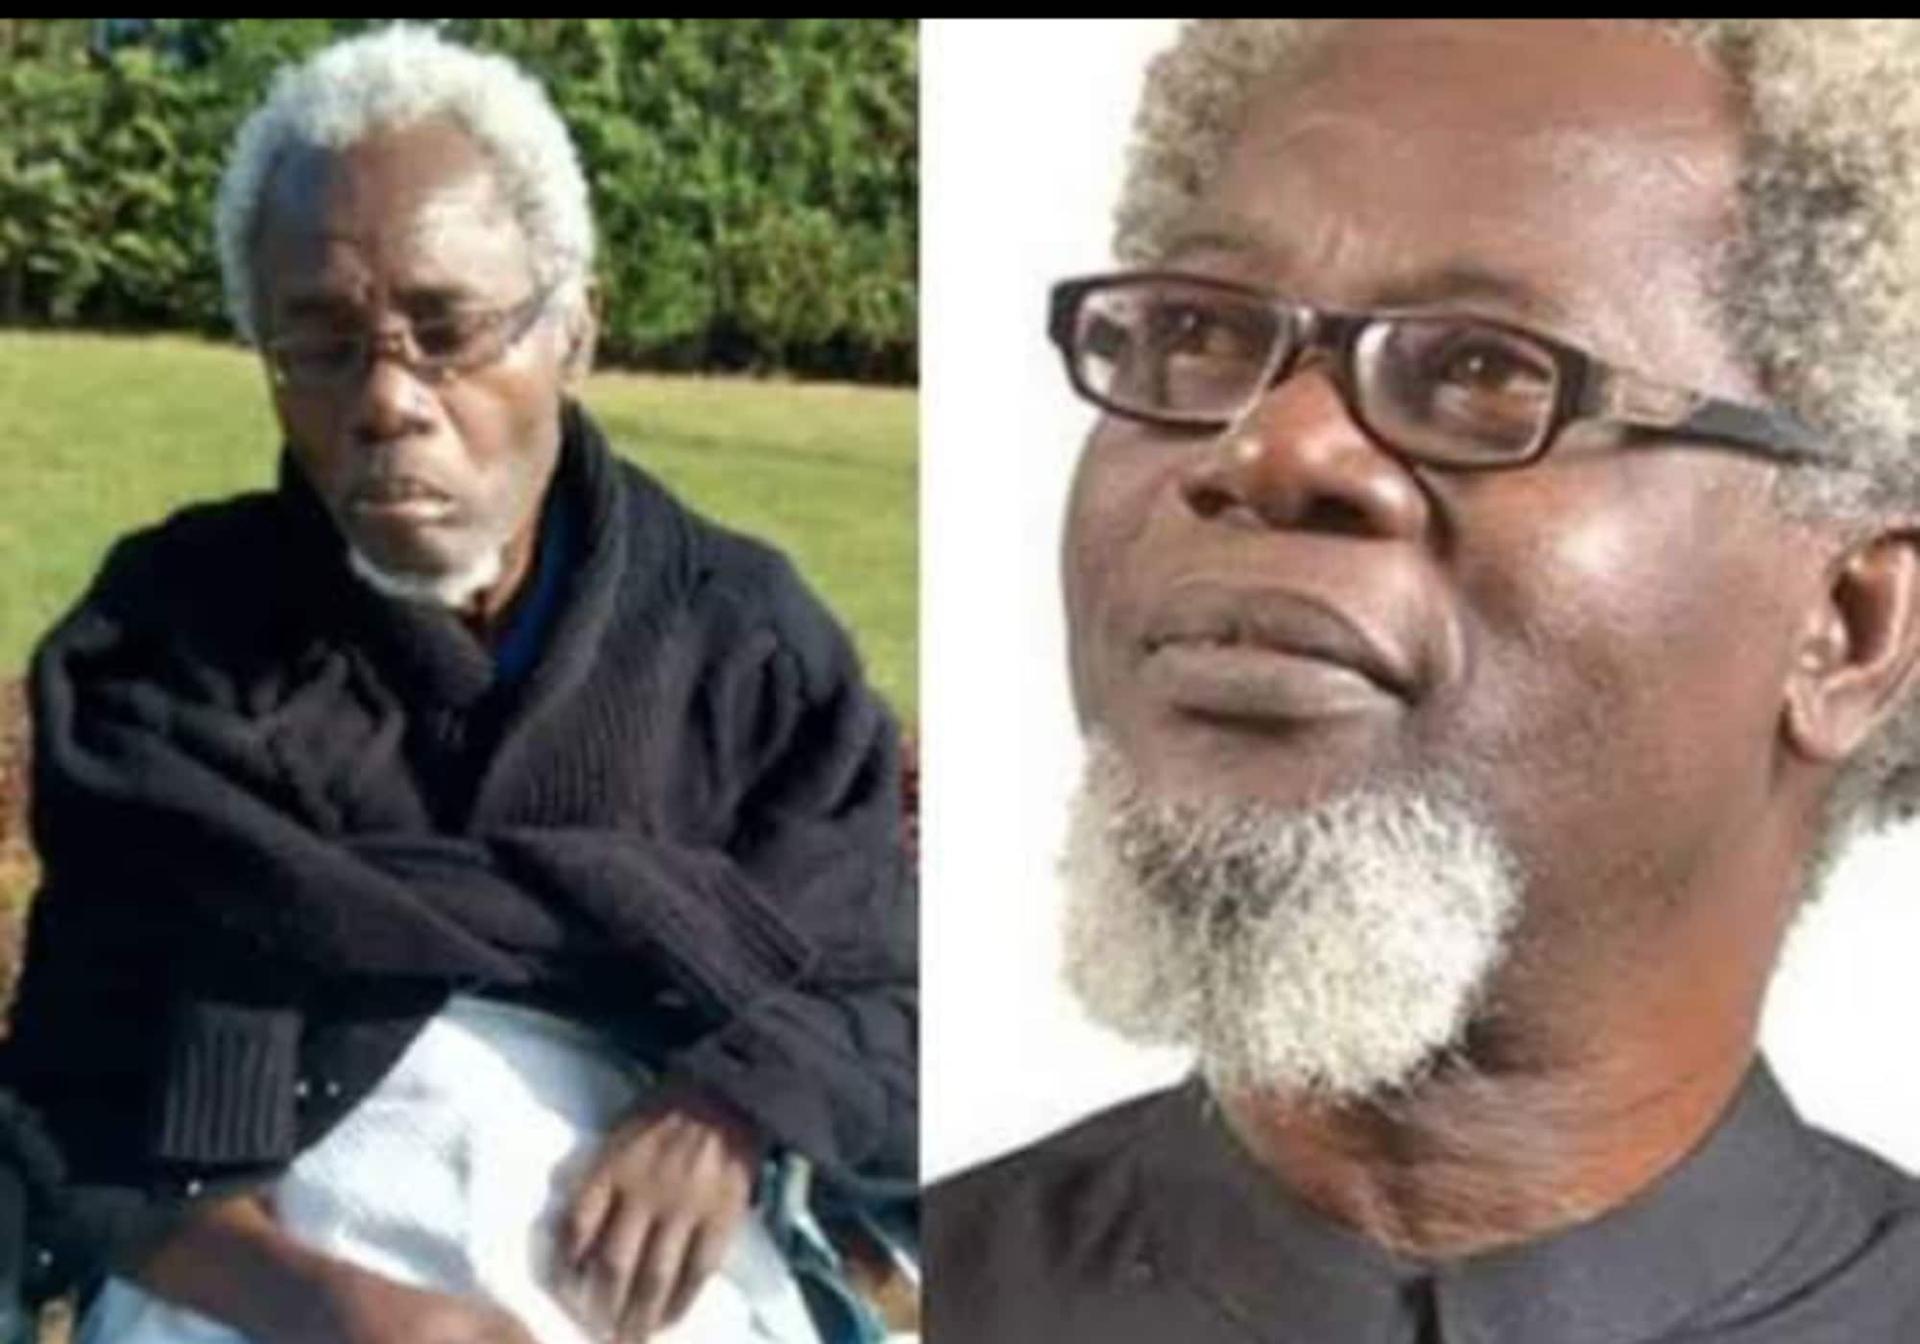 FG mourns Nollywood actor, Victor Olaotan